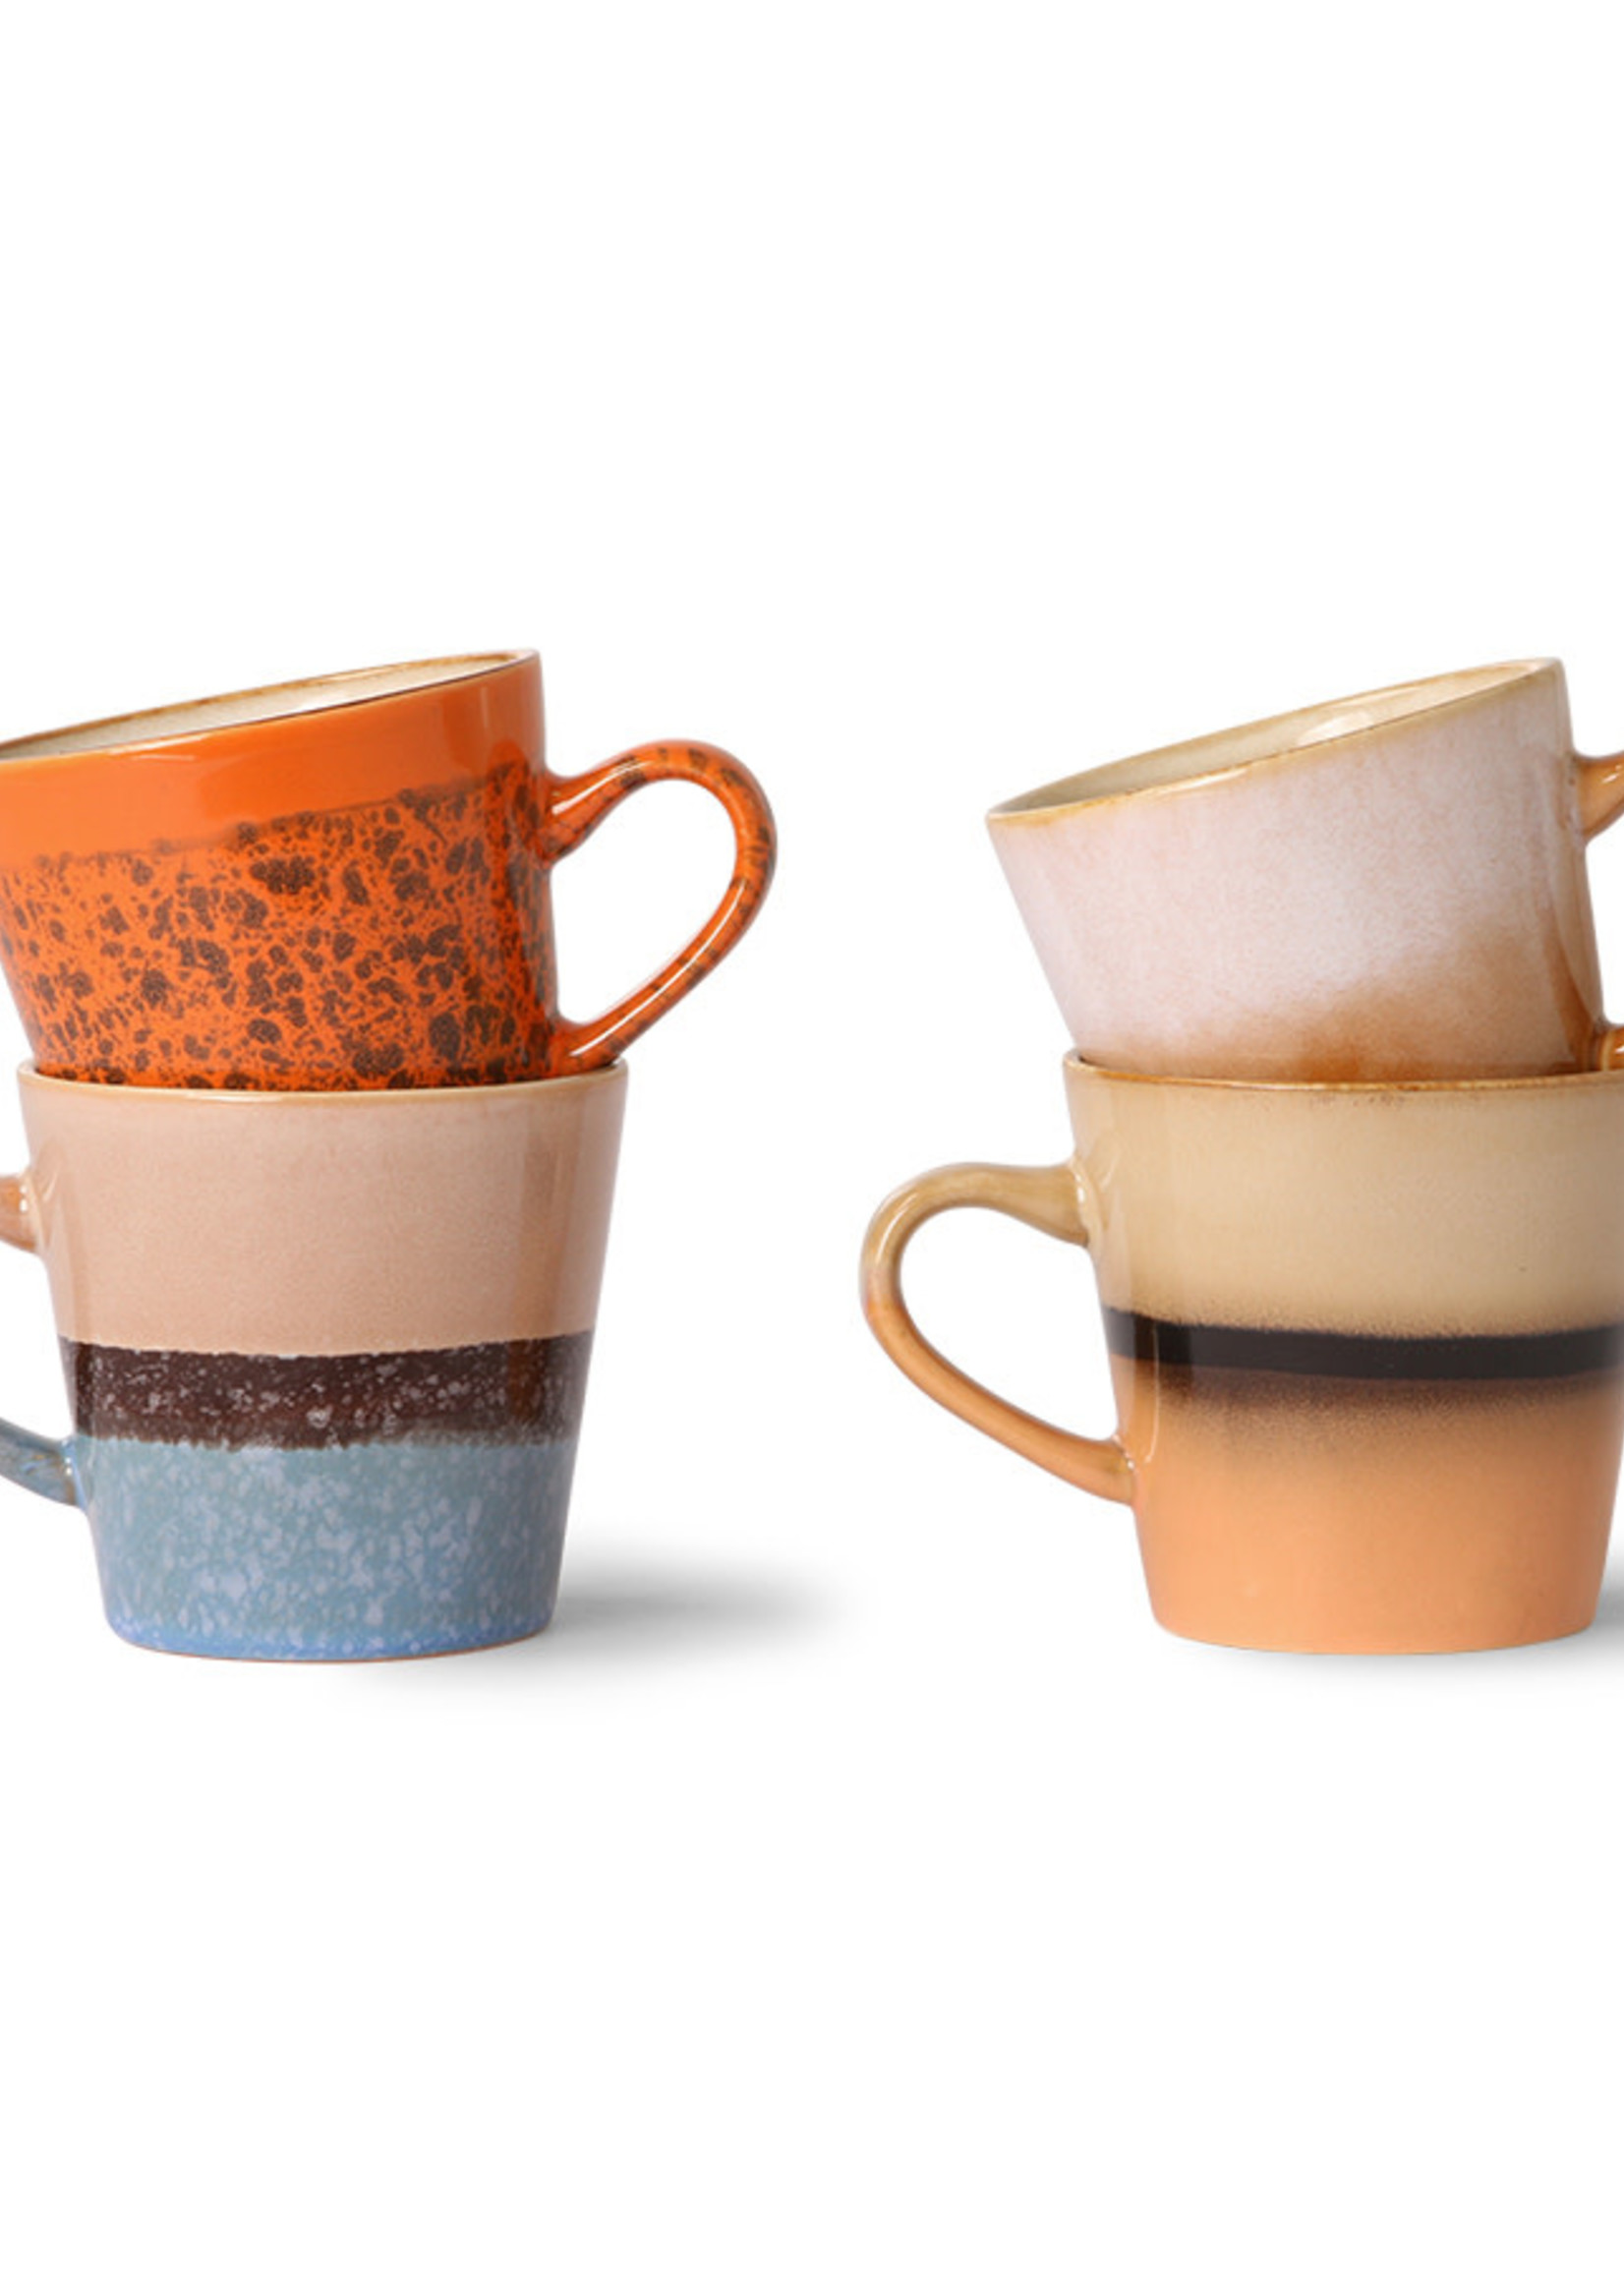 HKliving Ceramic americano 70's mug set